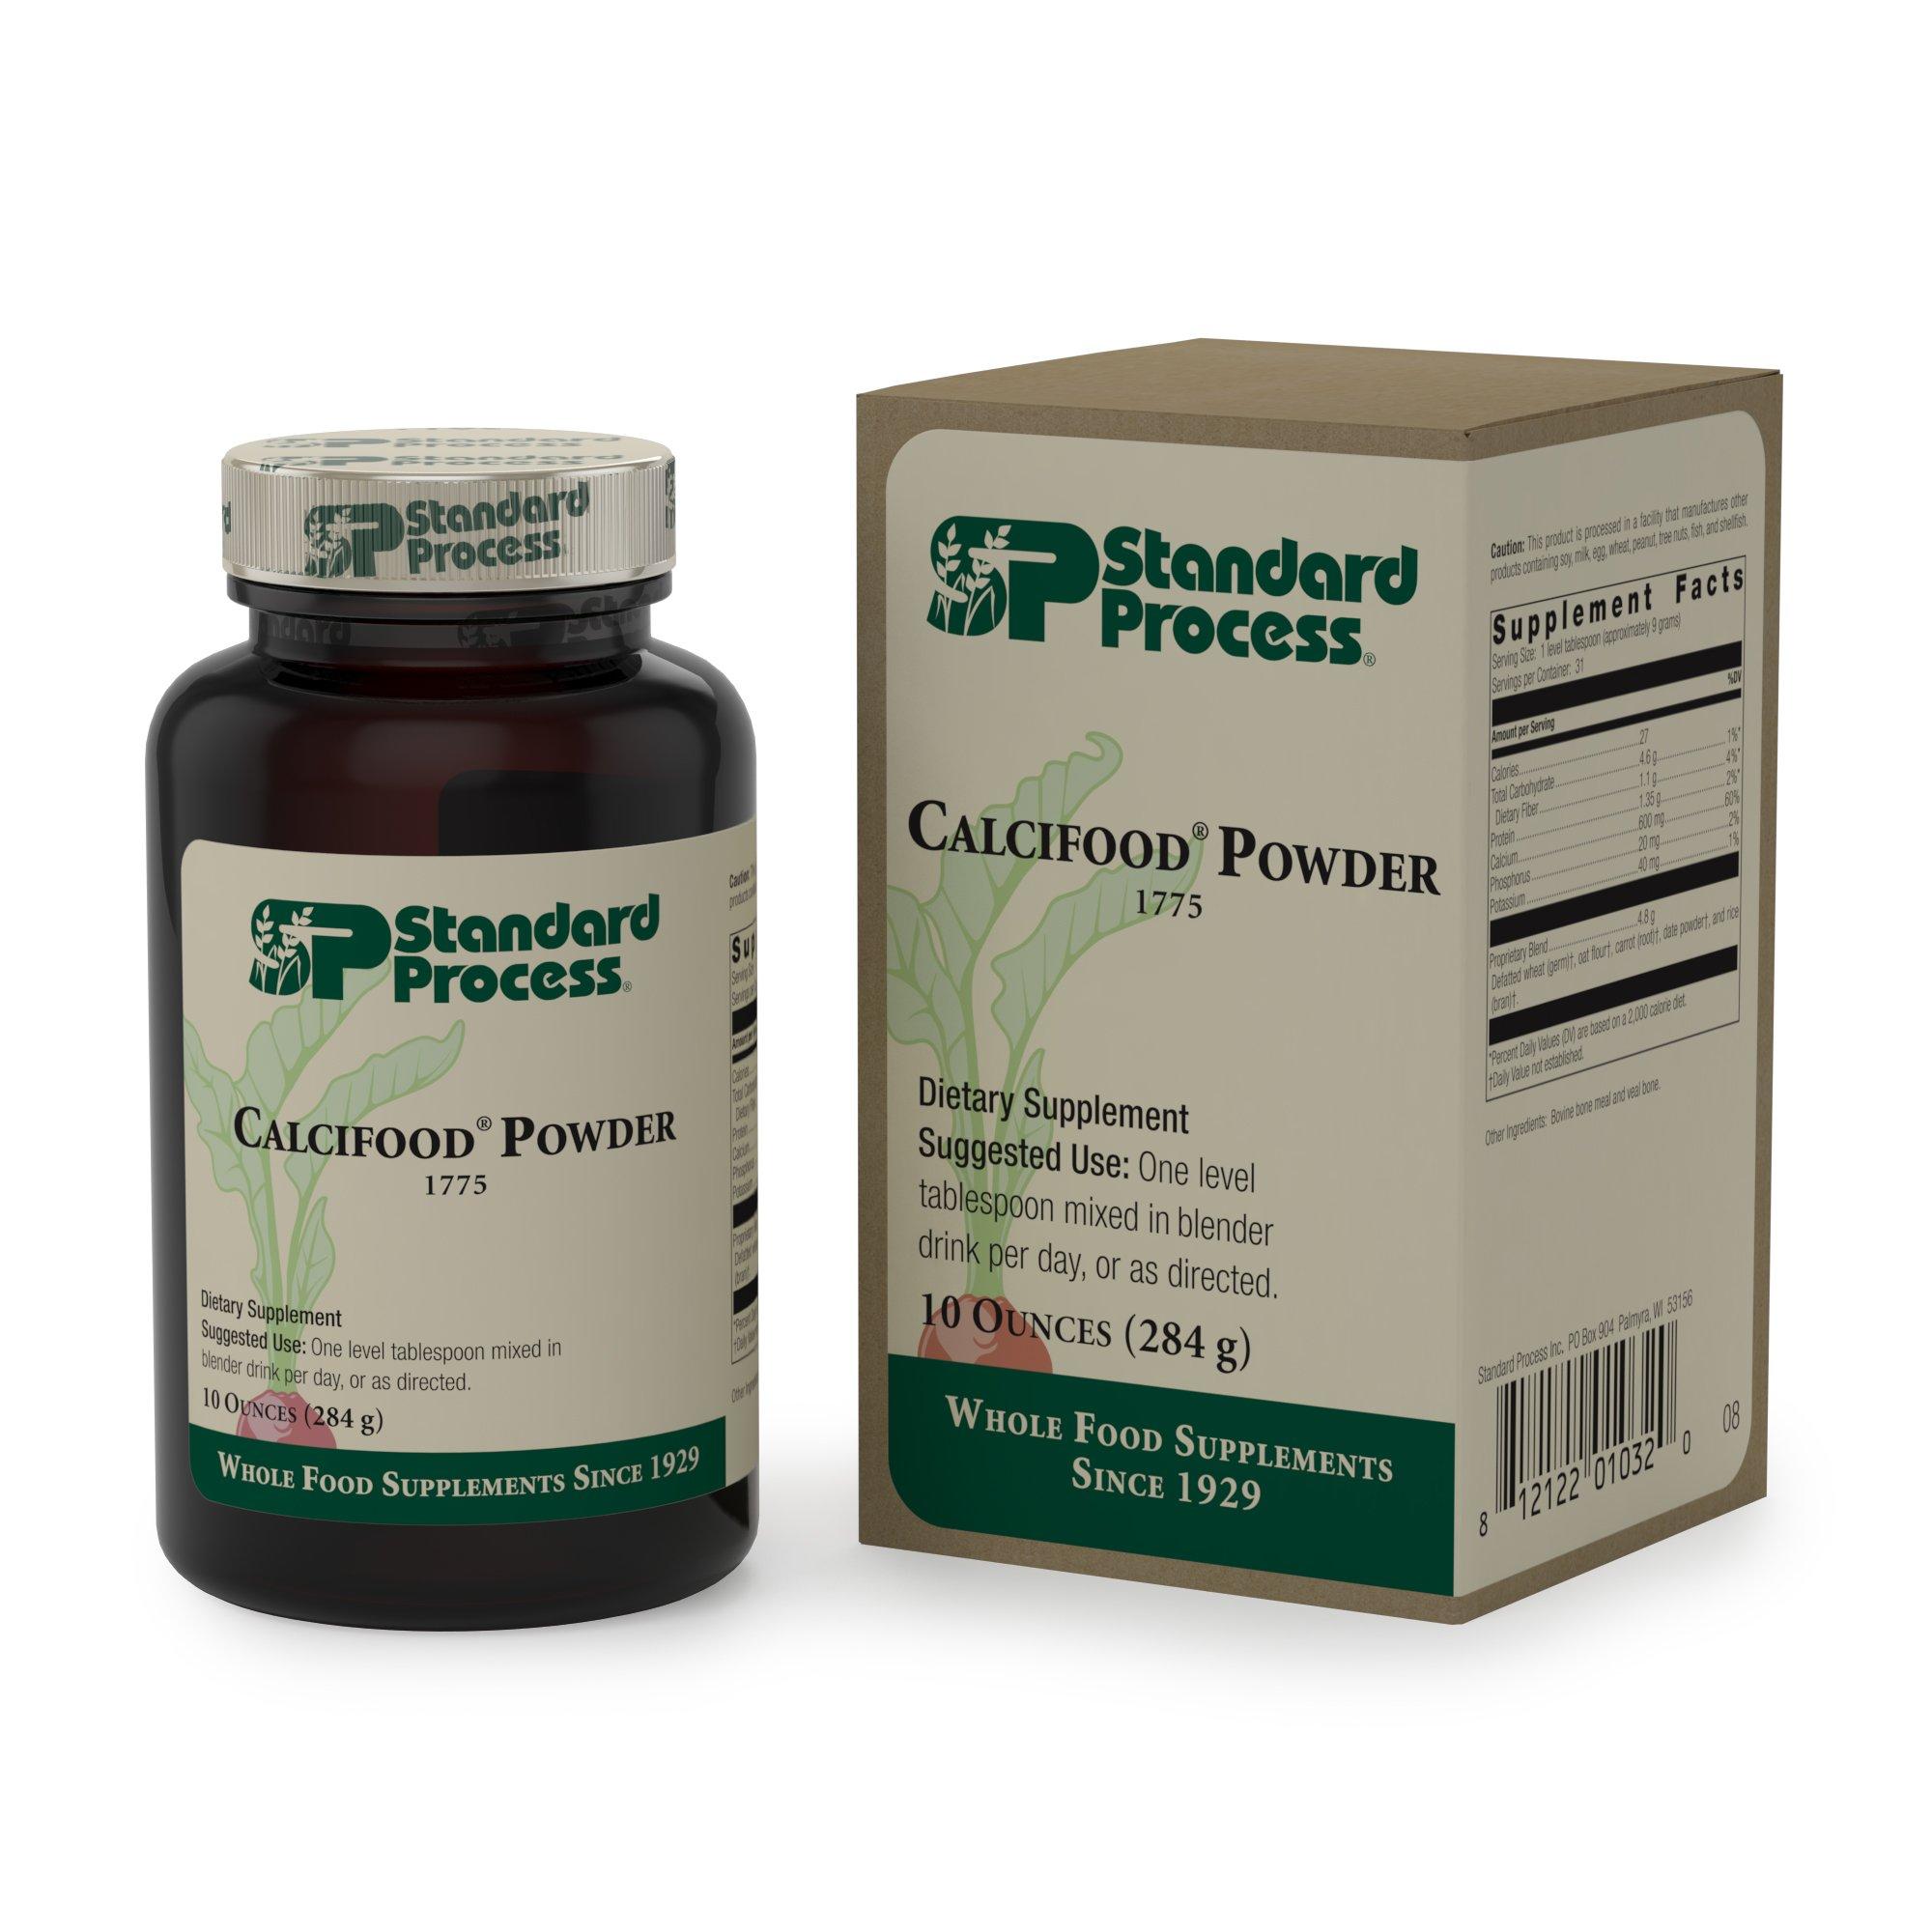 Standard Process - Calcifood Powder - Calcium Absorption Supplement, 600 mg Calcium, 20 mg Phosphorus, 40 mg Potassium, Supports Bone Health - 10 Ounces (284 Grams)